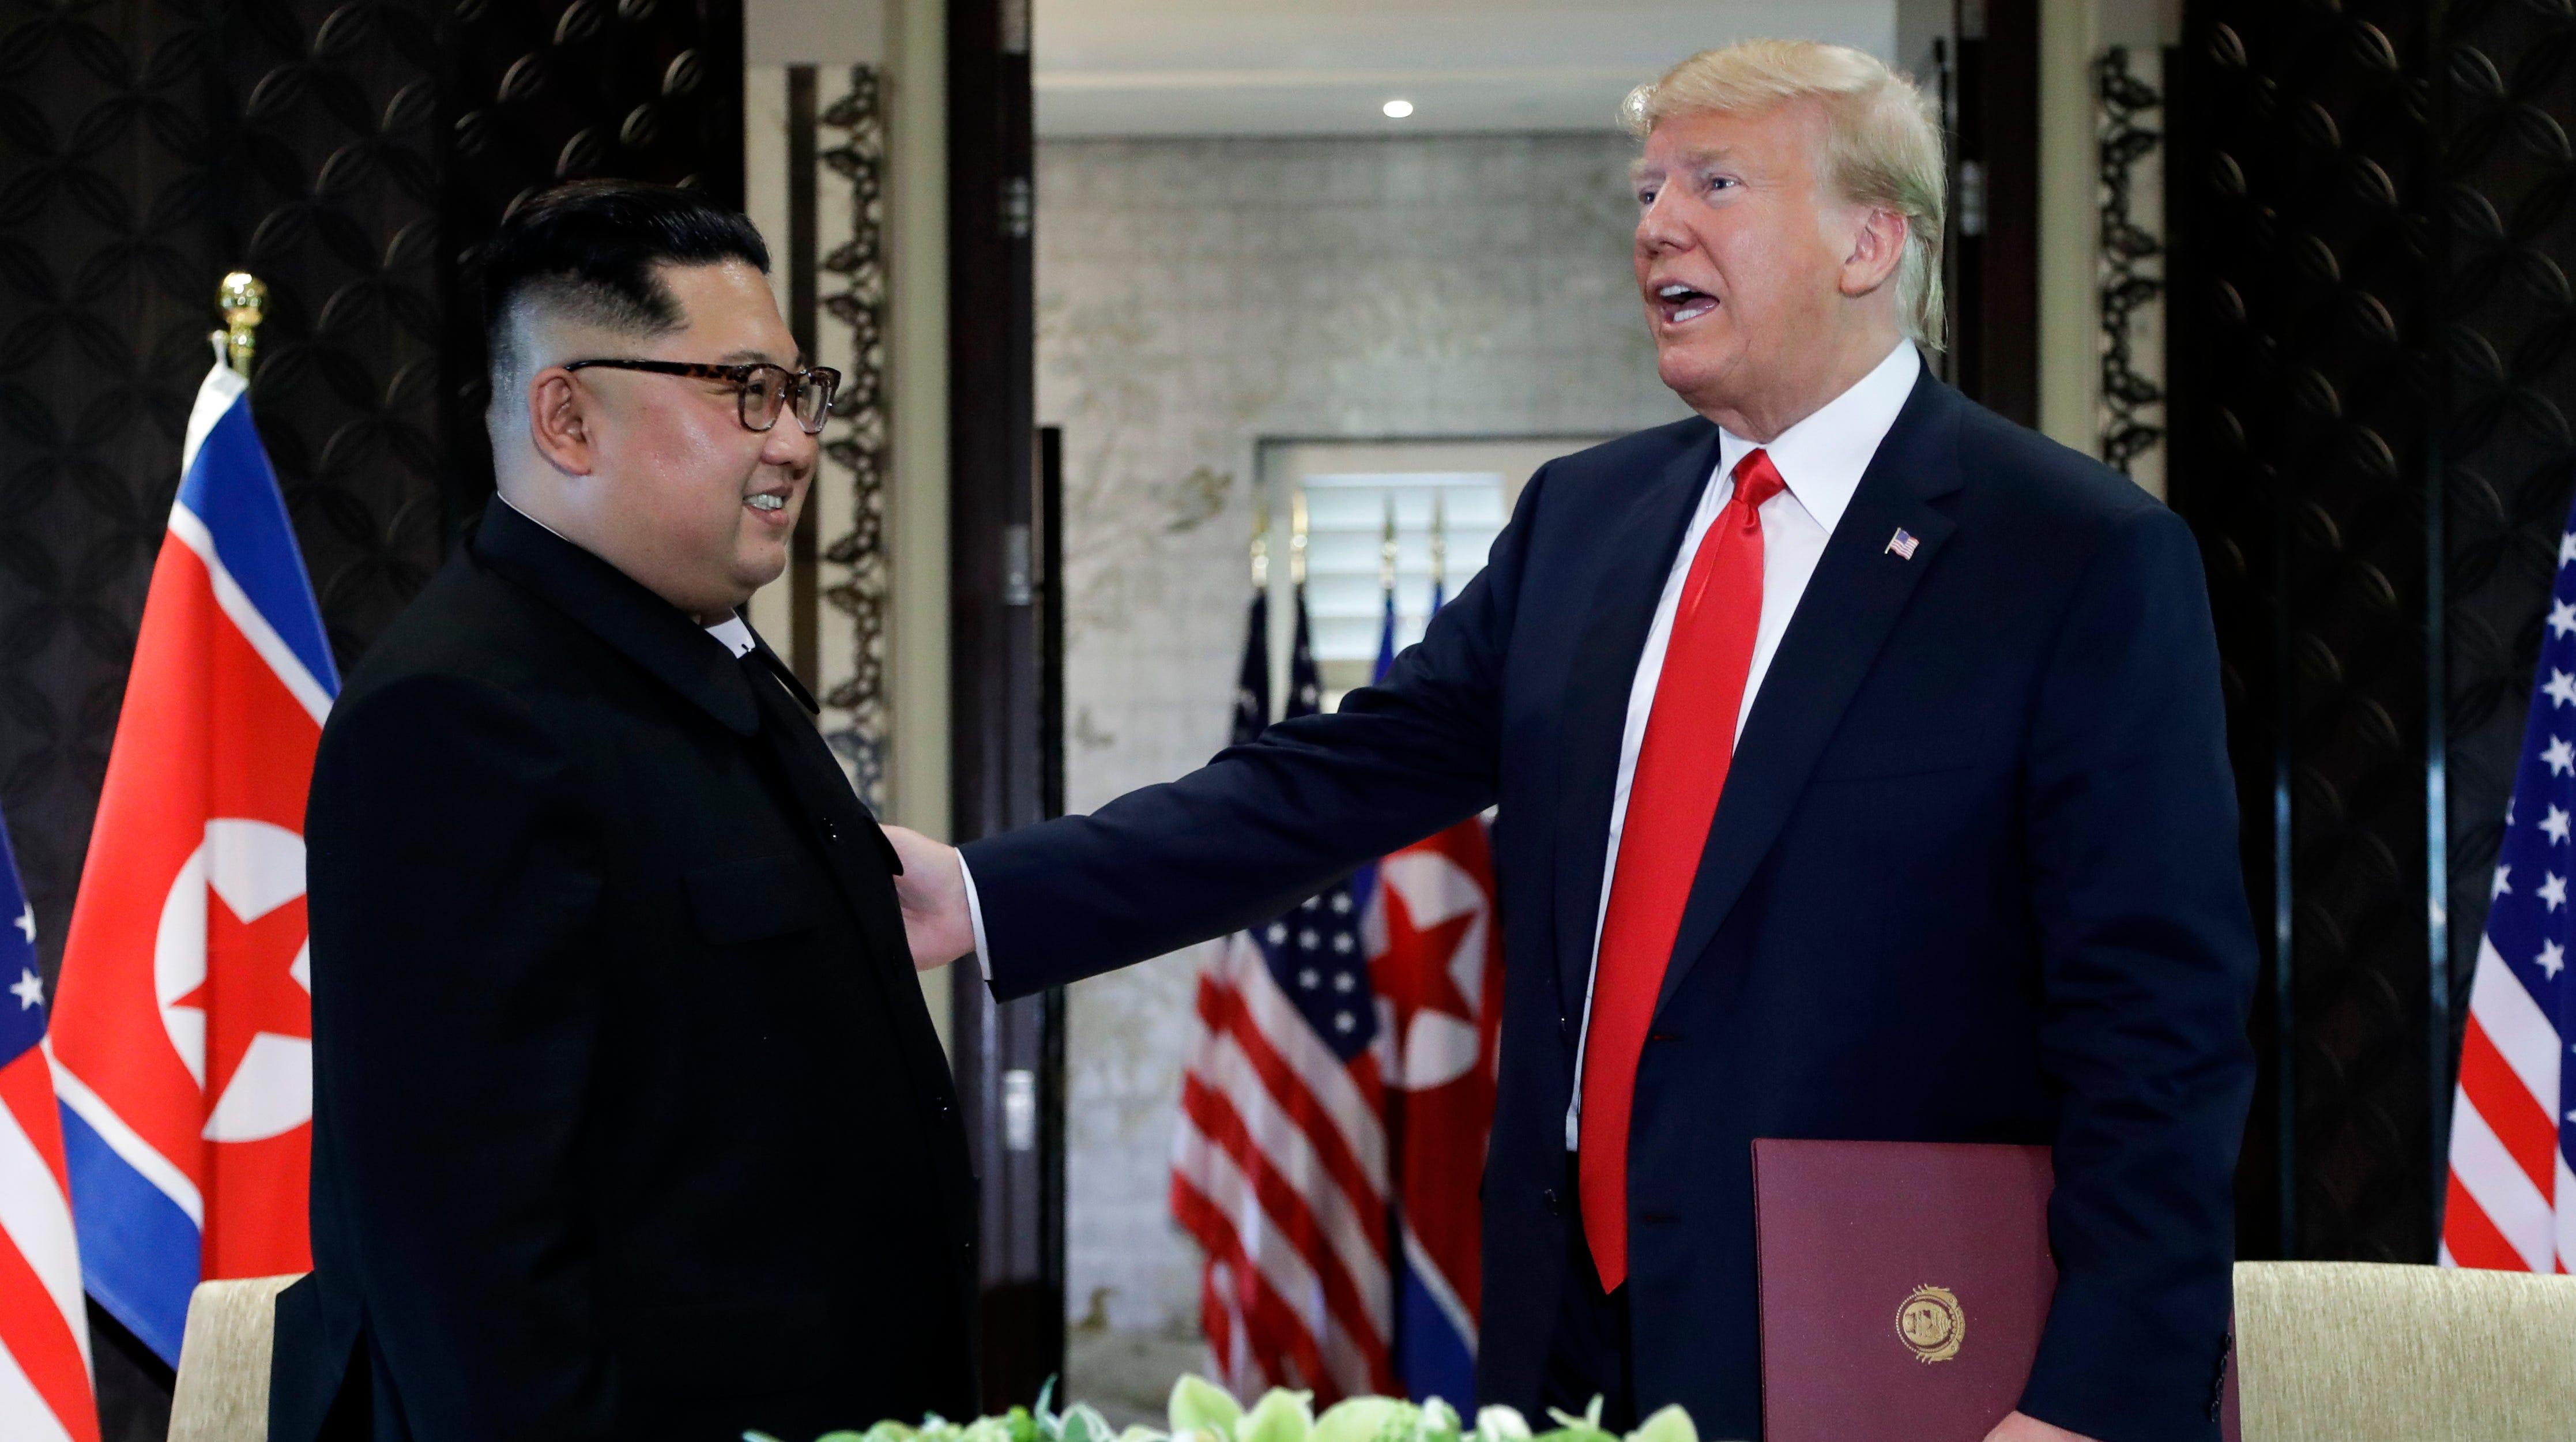 President Donald Trump and North Korea leader Kim Jong Un at their Singapore meeting in June.